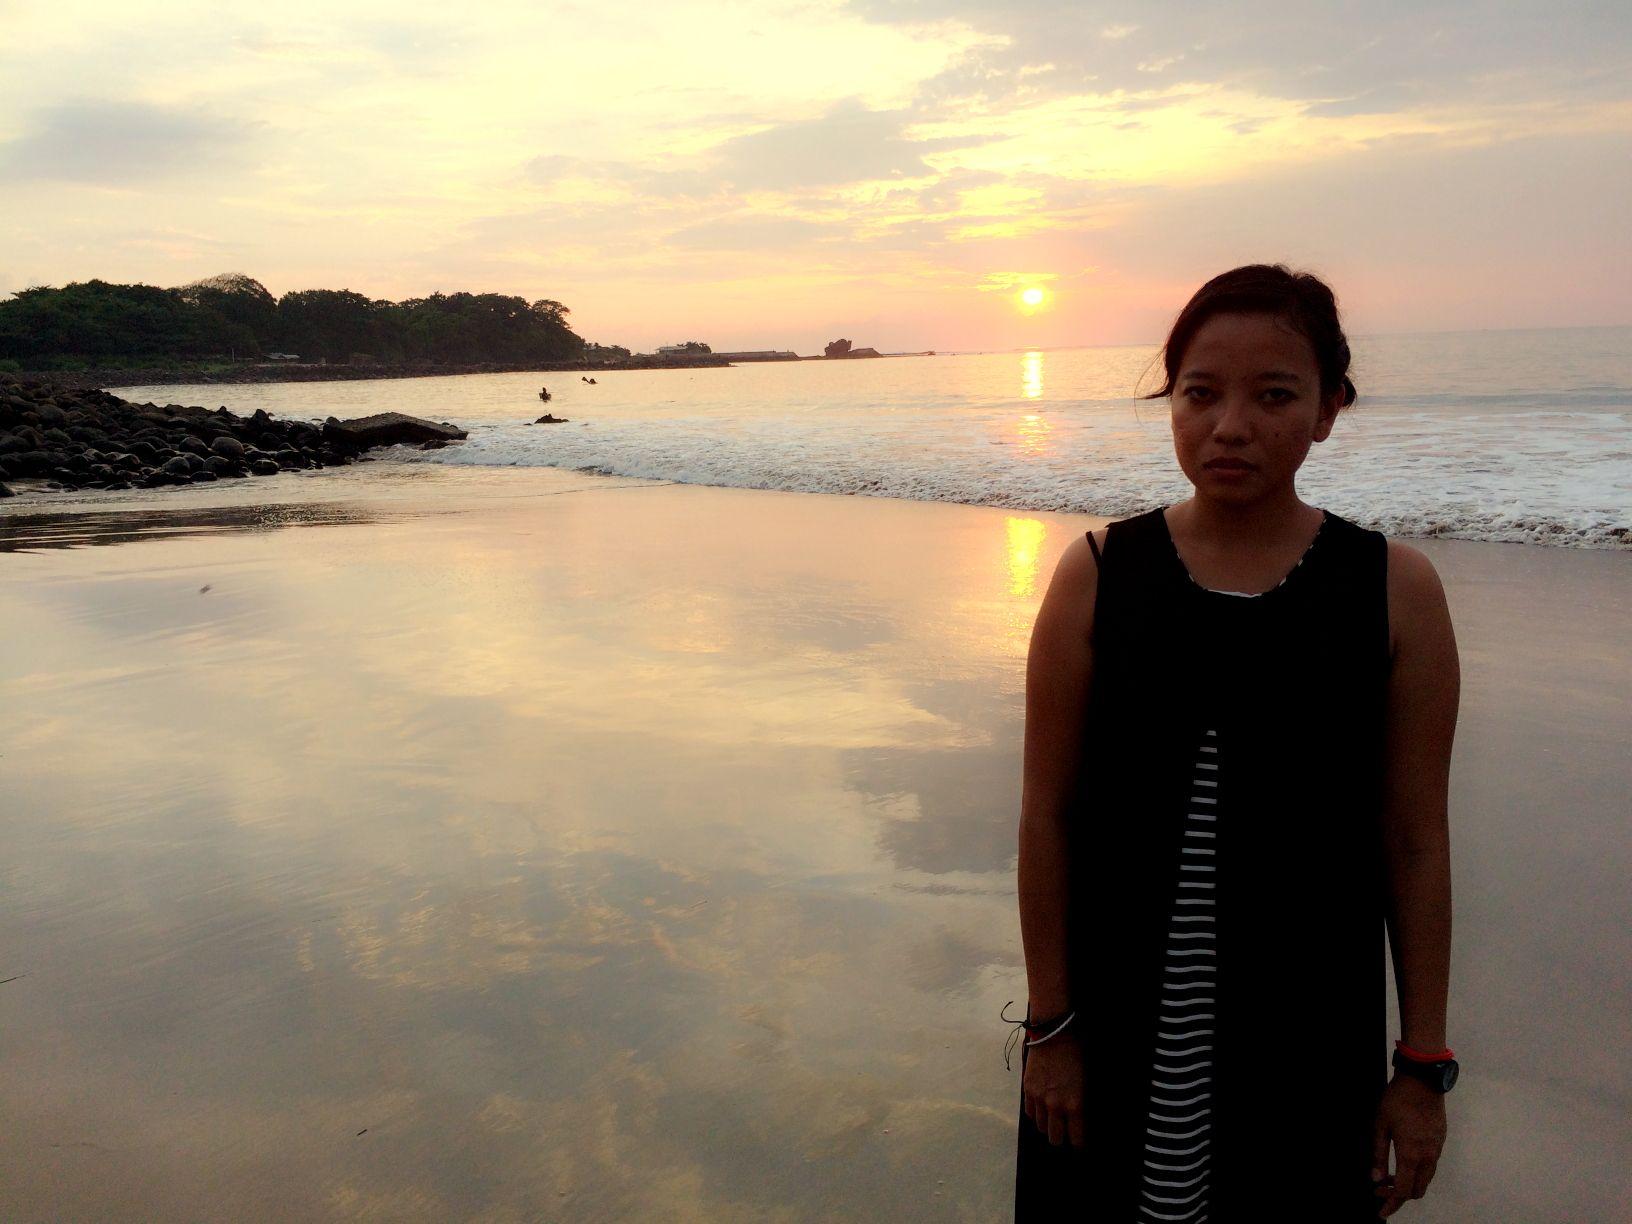 Sunset vista @Santolo Beach Garut Selatan